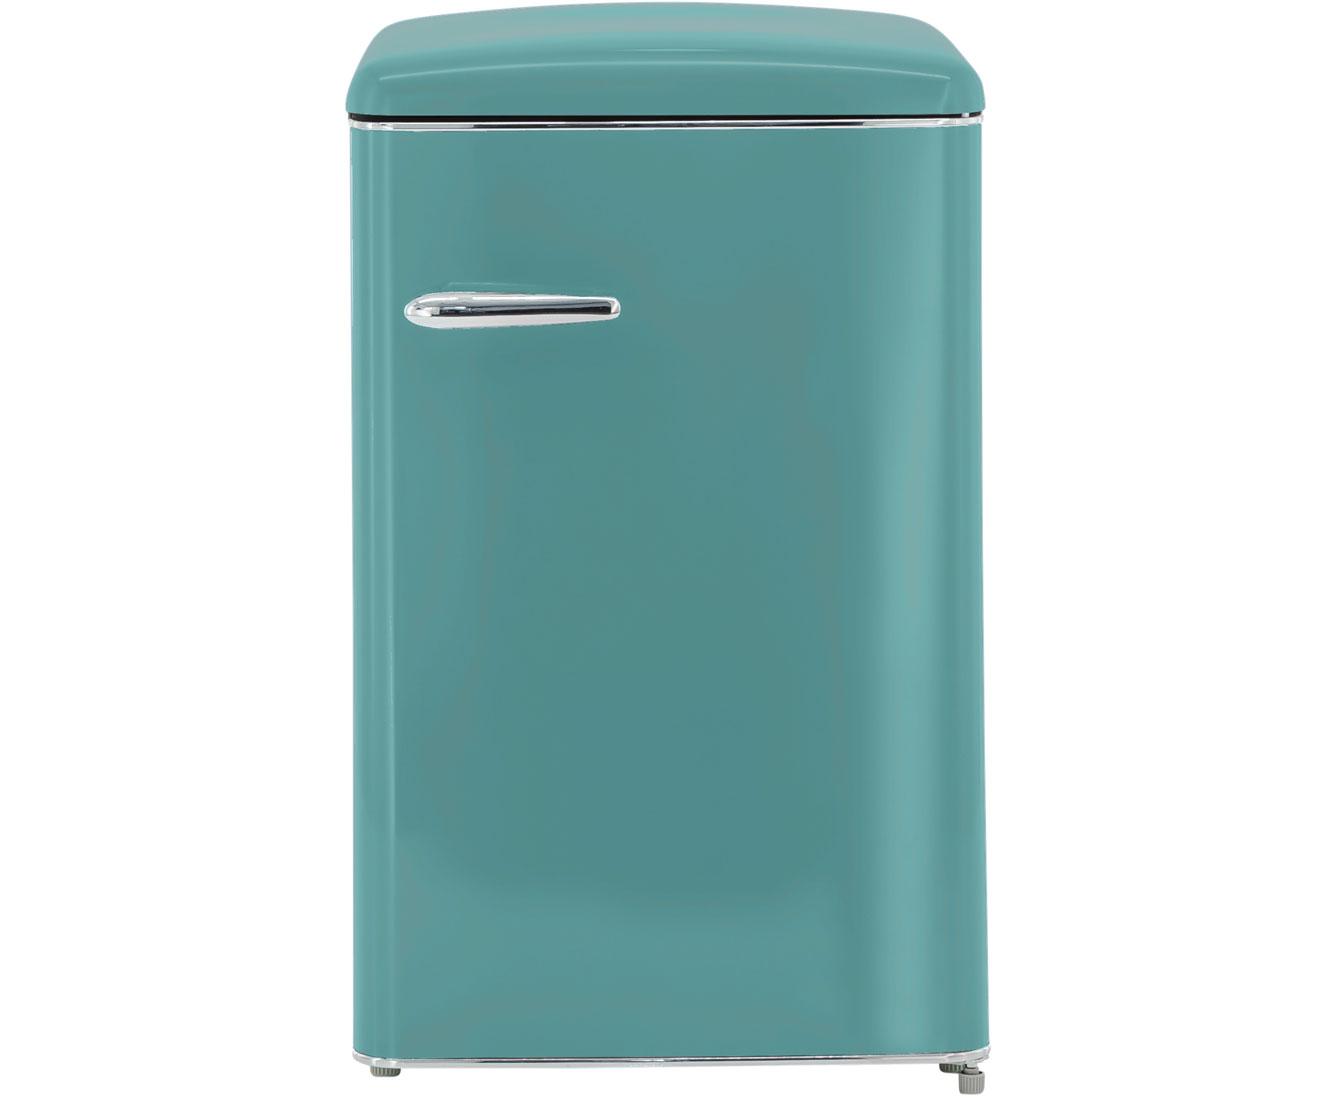 Retro Kühlschrank Blau : Exquisit rks 120 16 rva kühlschrank blau retro design a